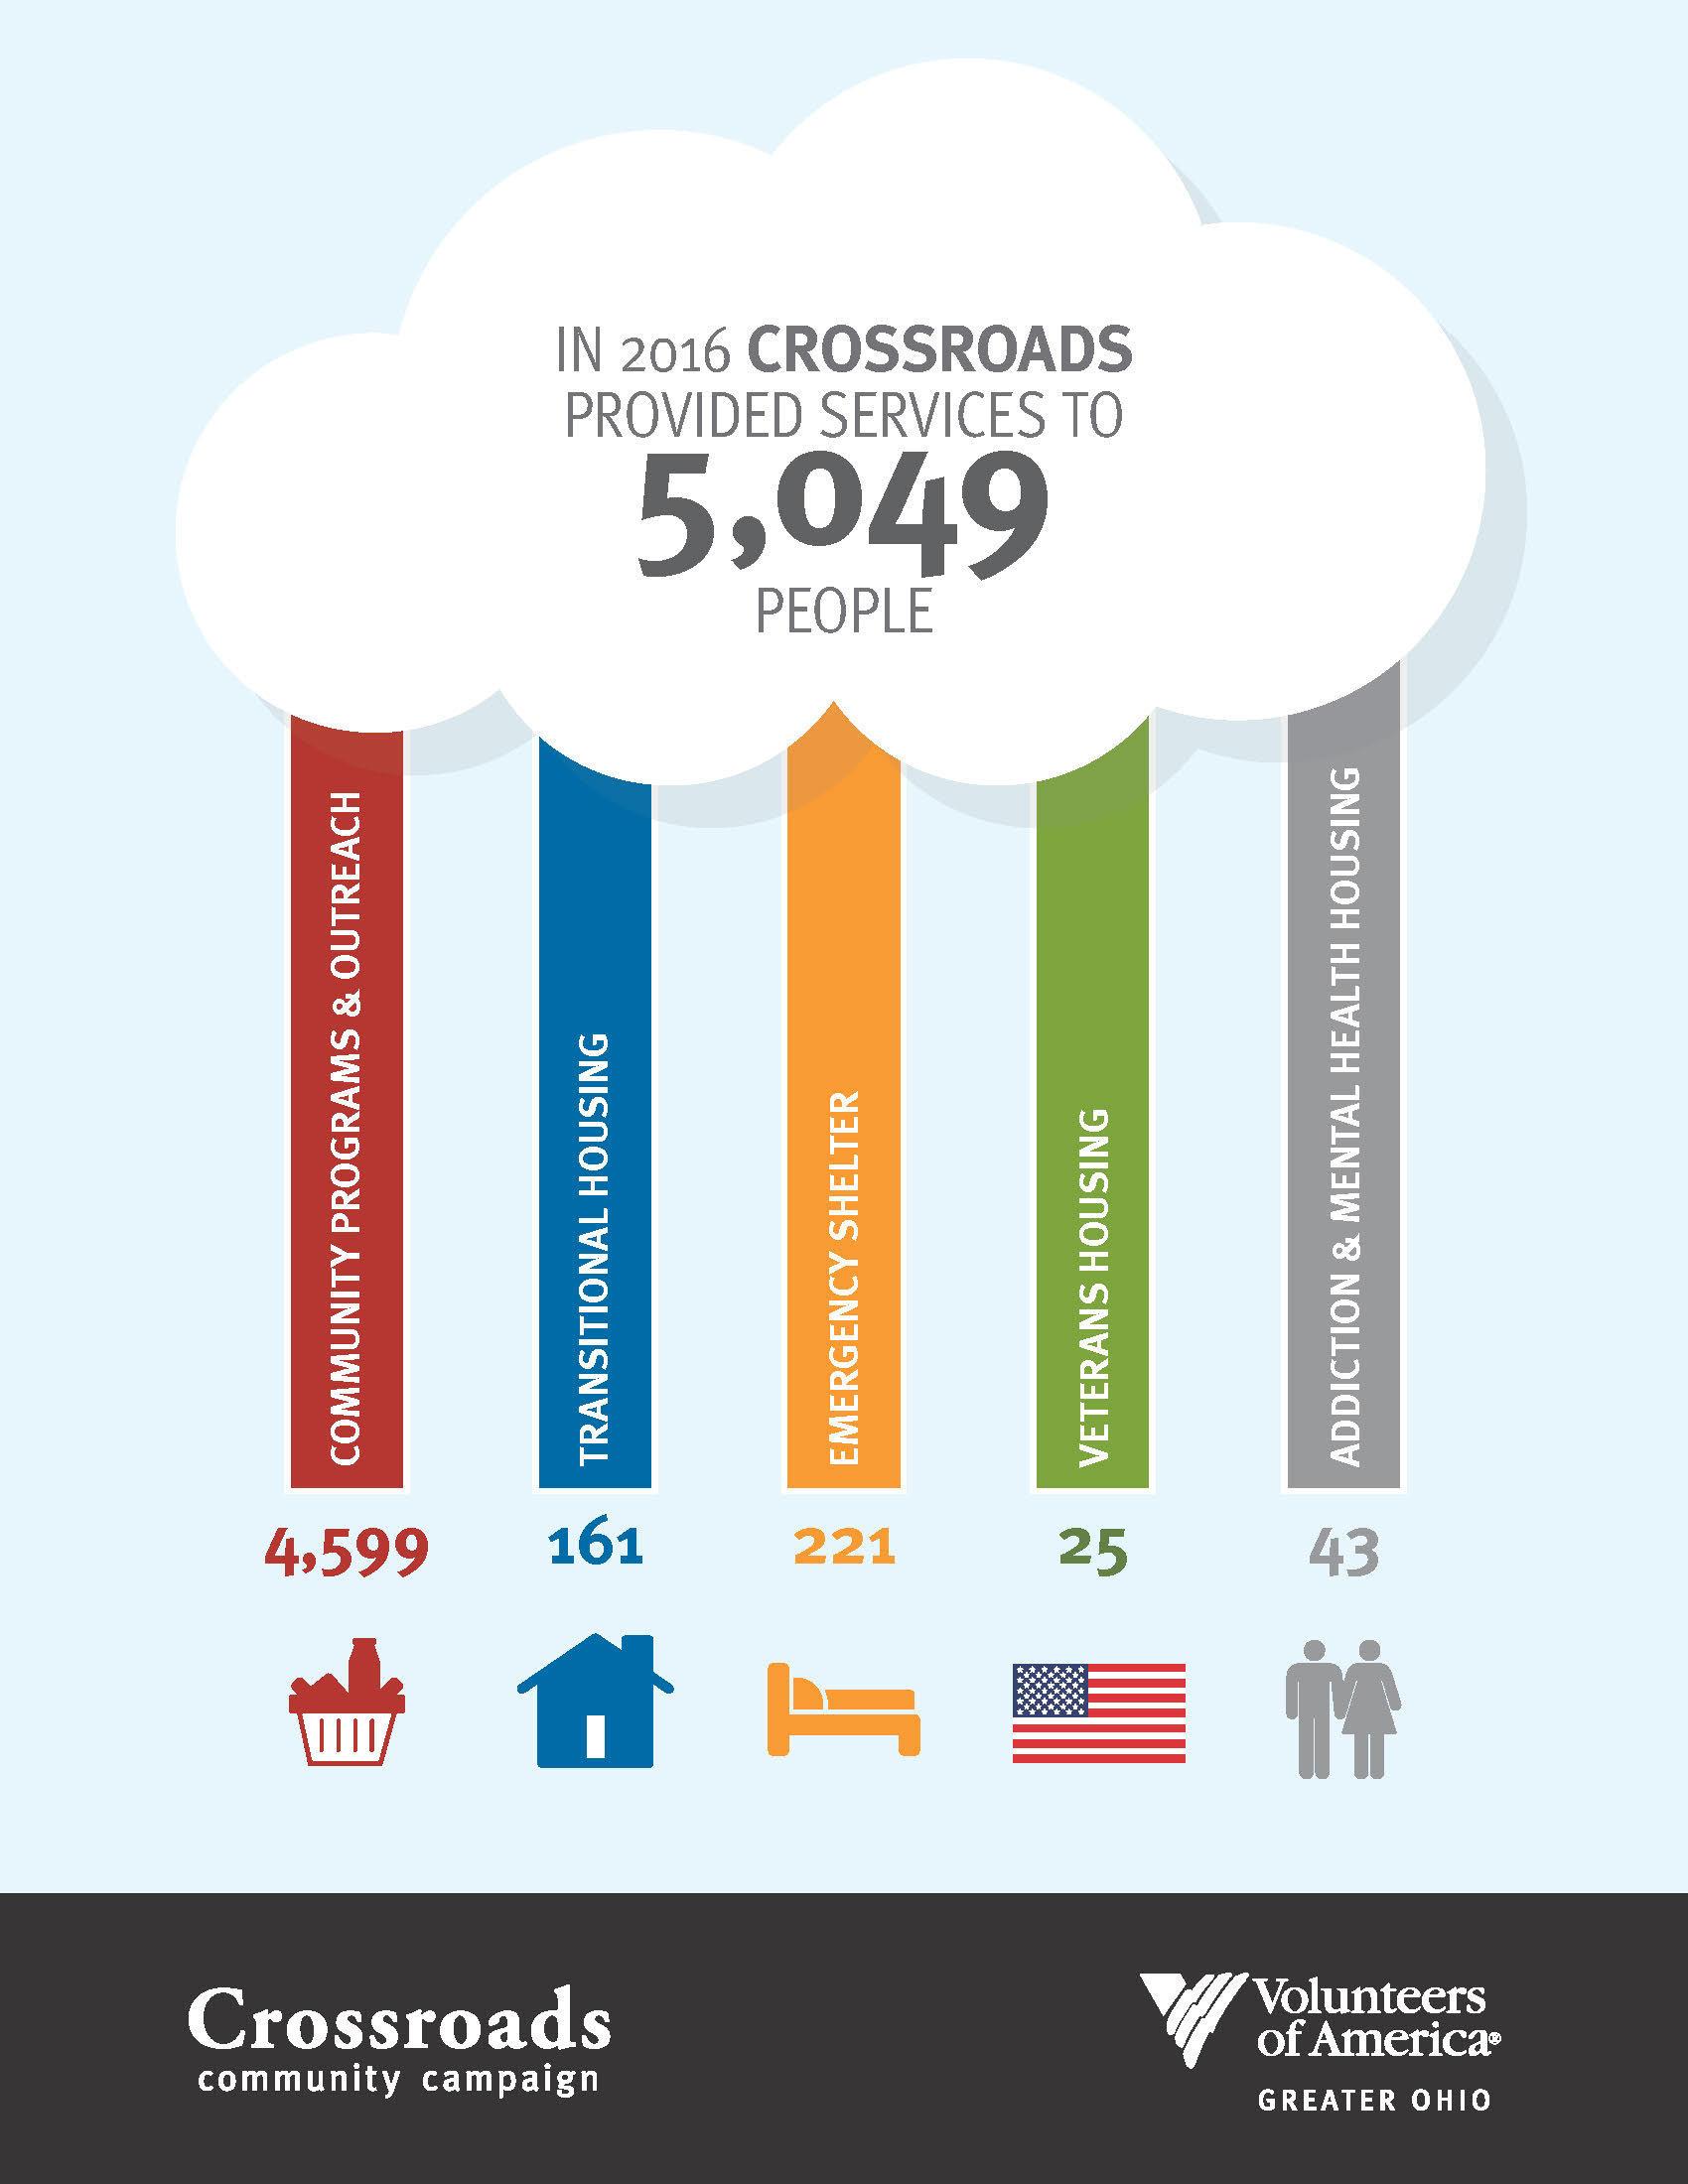 Crossroads serves 5,049 people